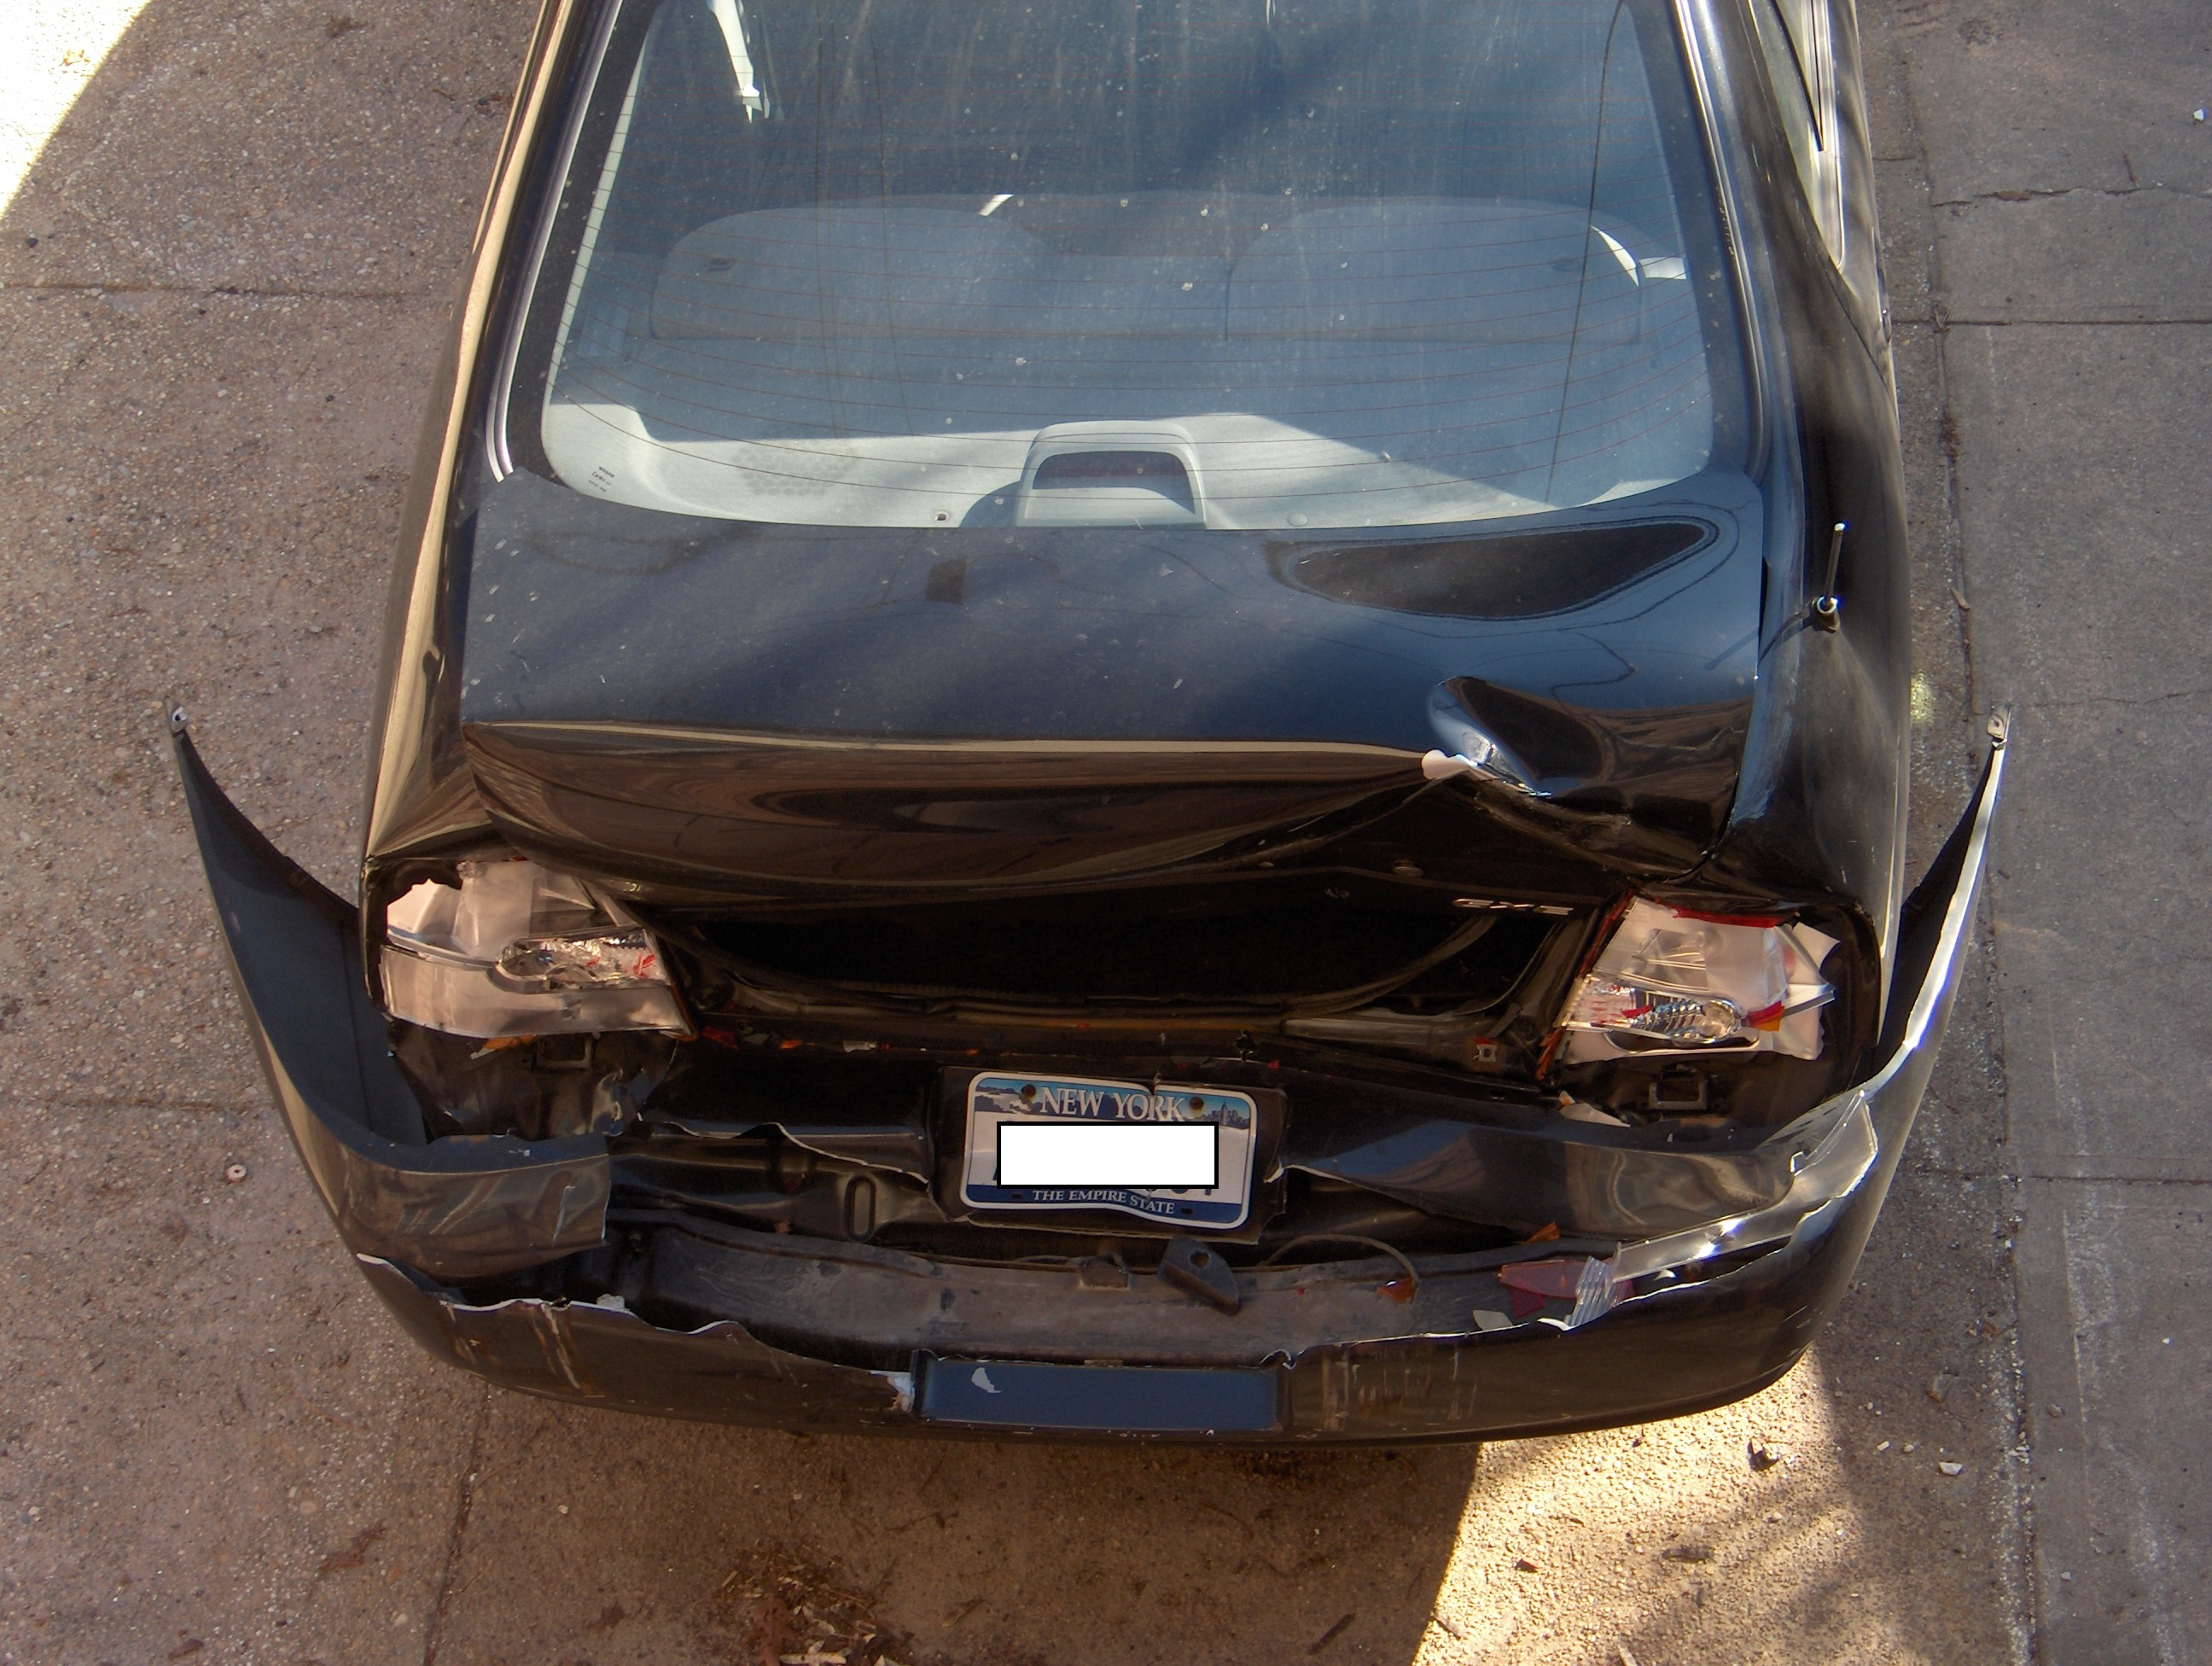 Seat back failures during car crash can cause serious injuries | Top ...